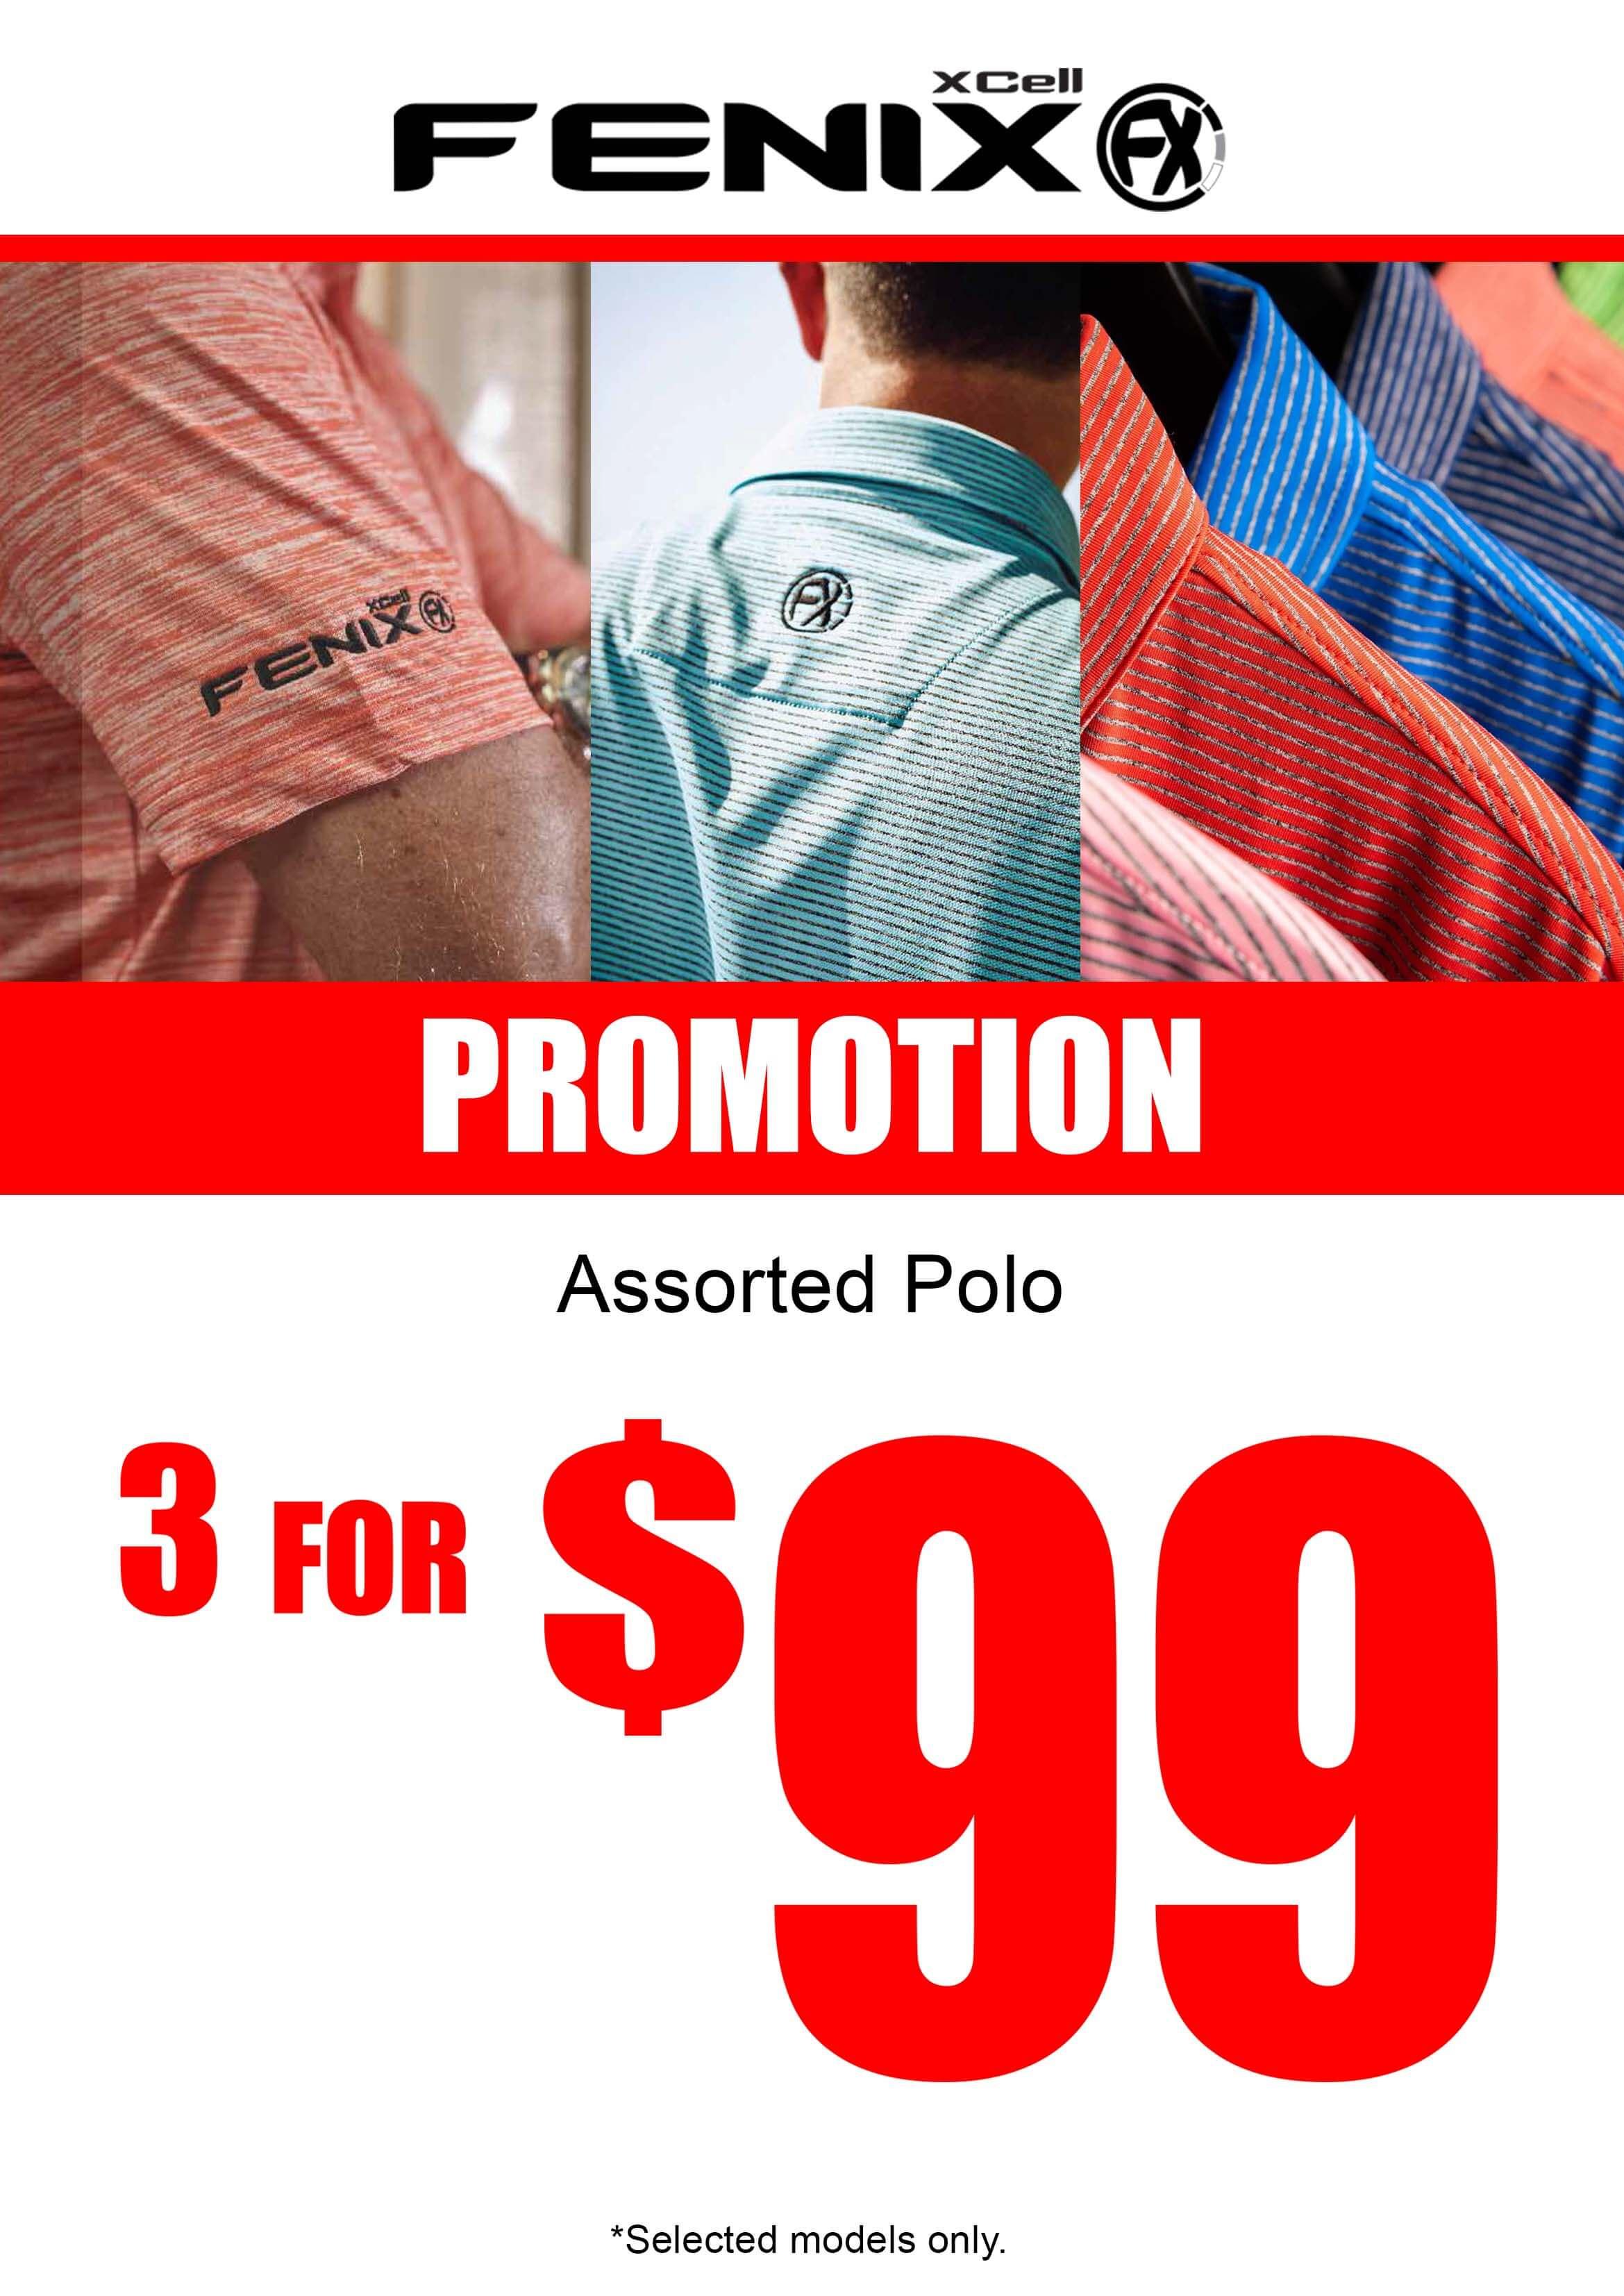 Fenix Apparel Promotion